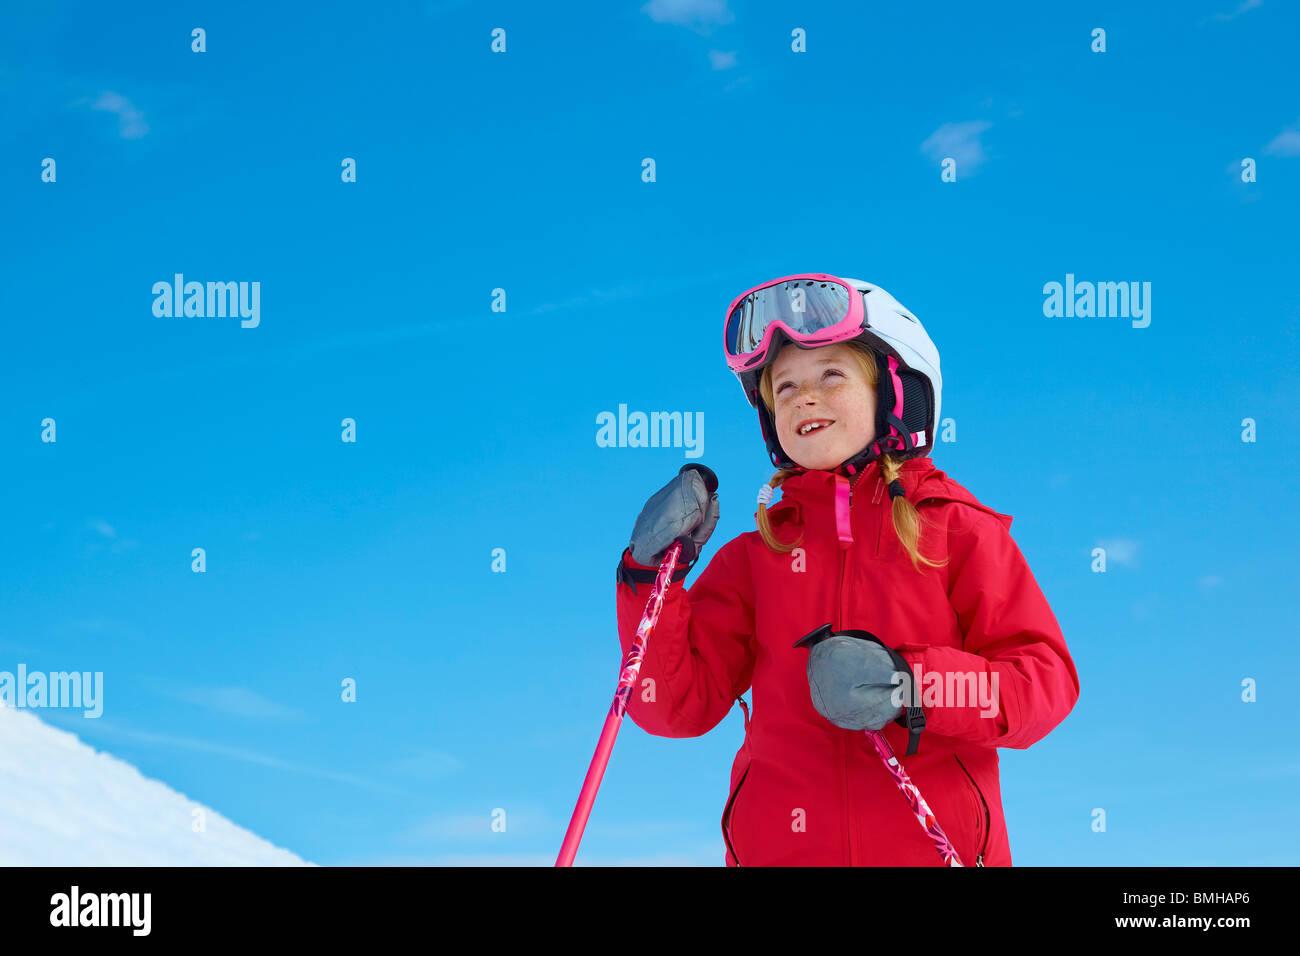 Girl skiing, blue sky - Stock Image